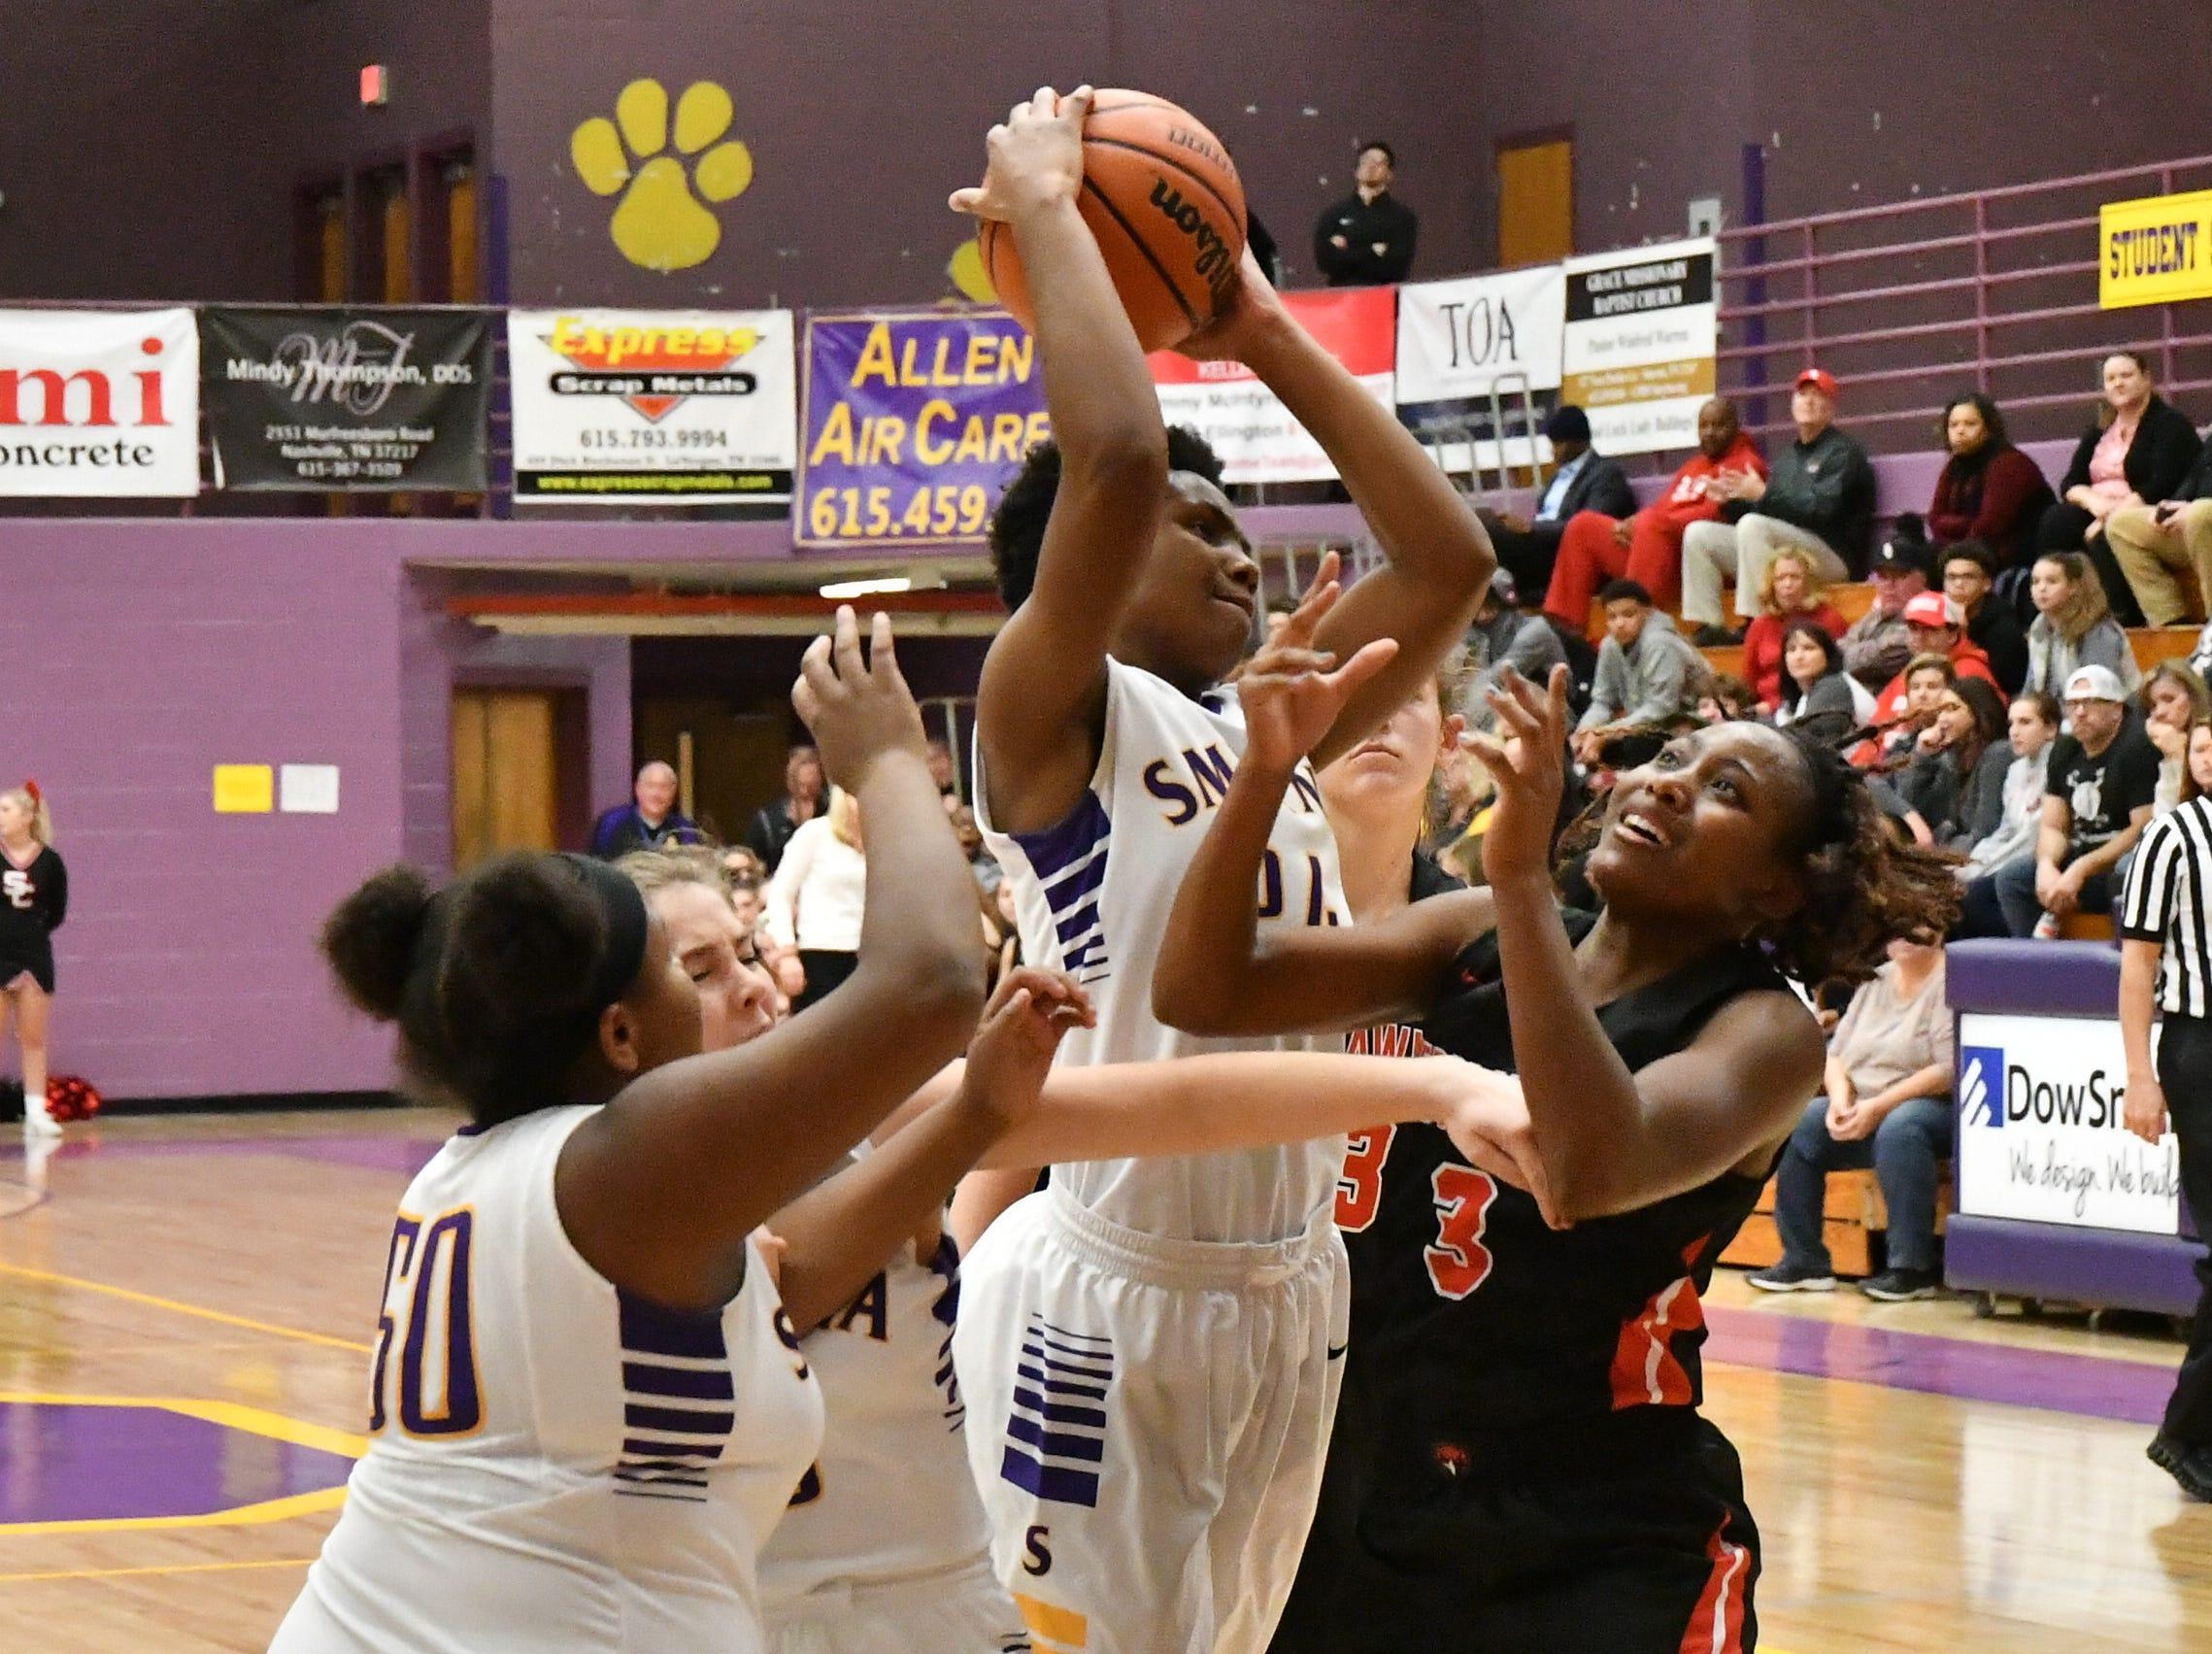 Smyrna's Nakia Drew battles inside as Stewarts Creek players defend.